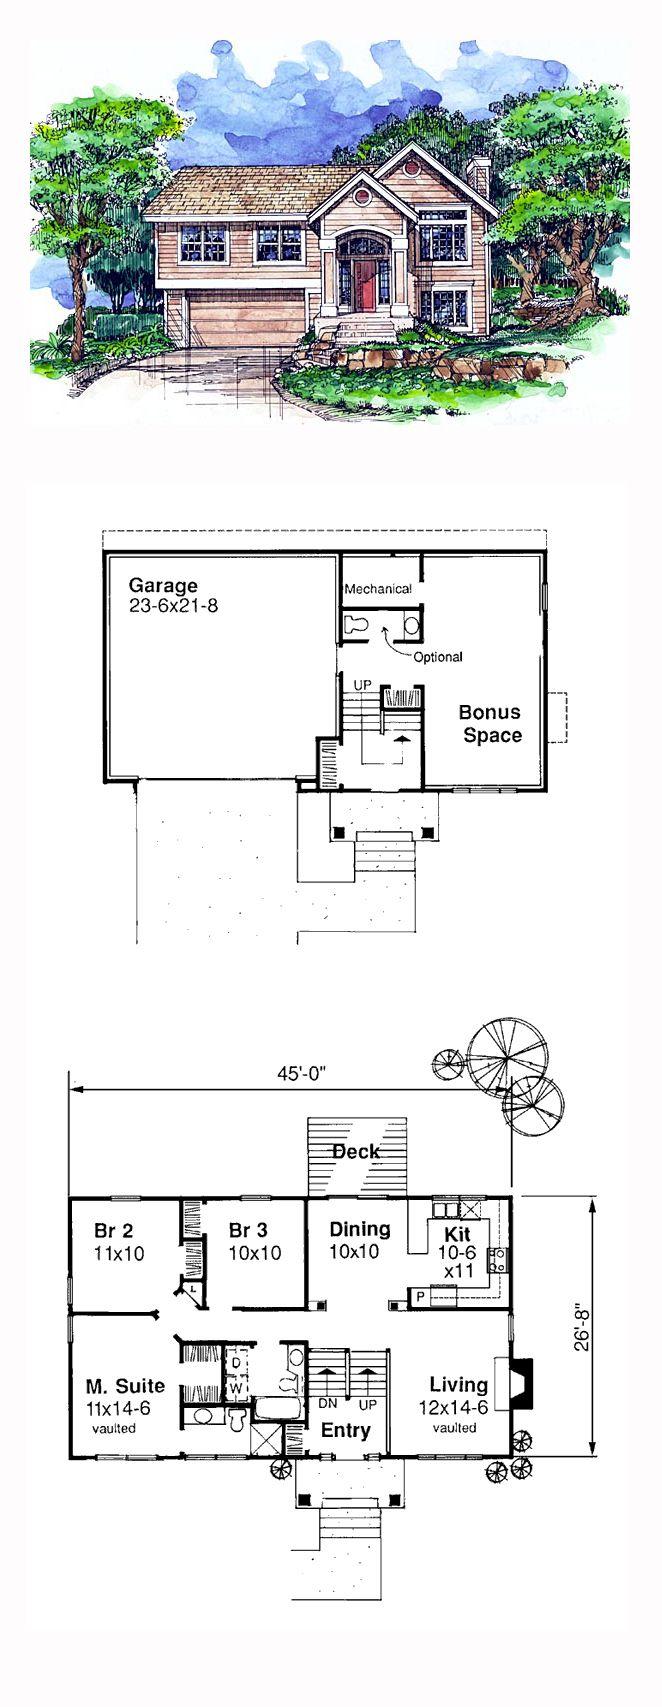 Hillside home plans 10 handpicked ideas to discover in for Hillside home floor plans